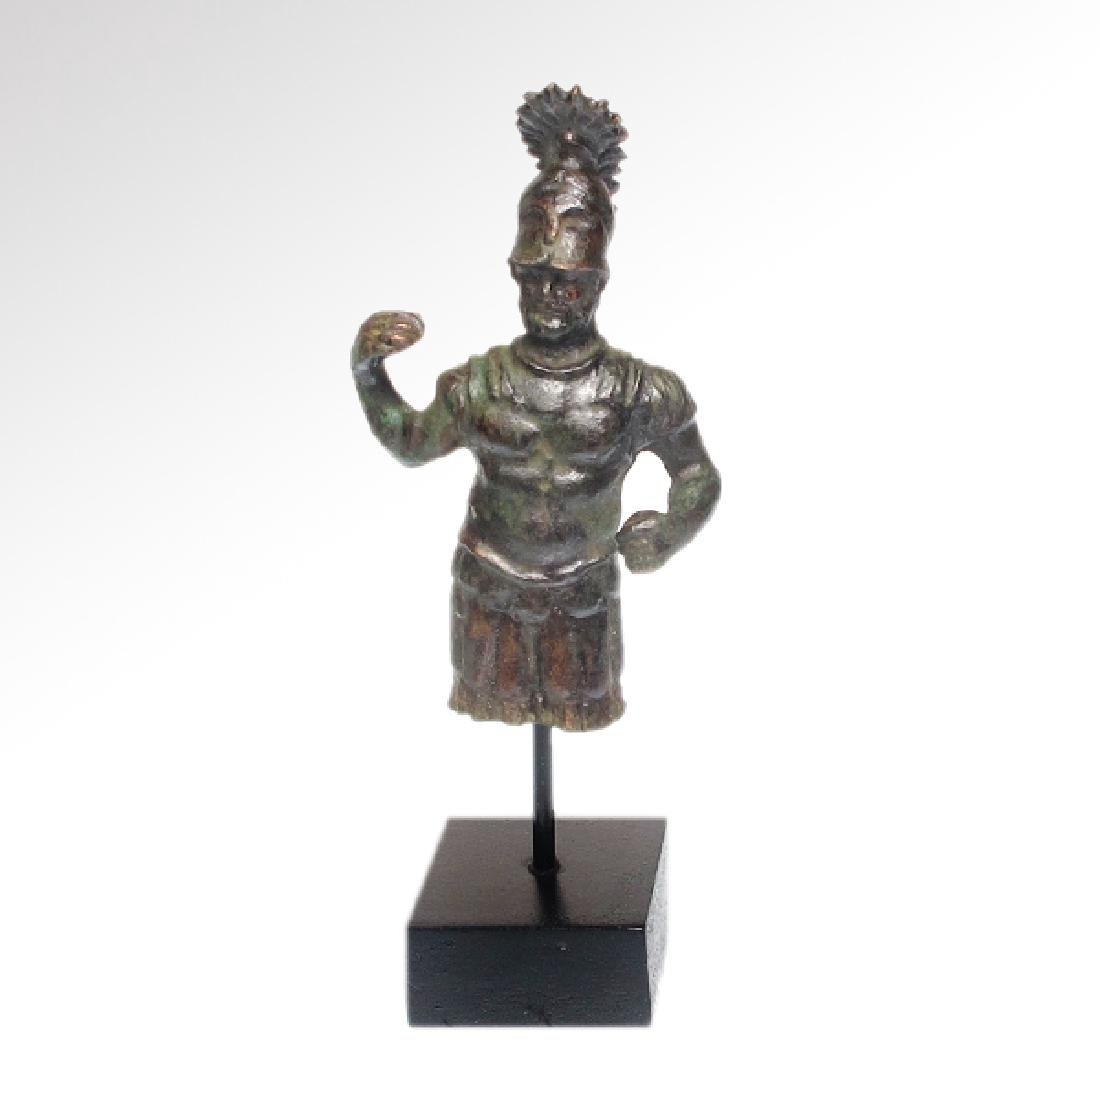 Roman Bronze Figure of Mars, c. 1st-3rd Century A.D. - 2